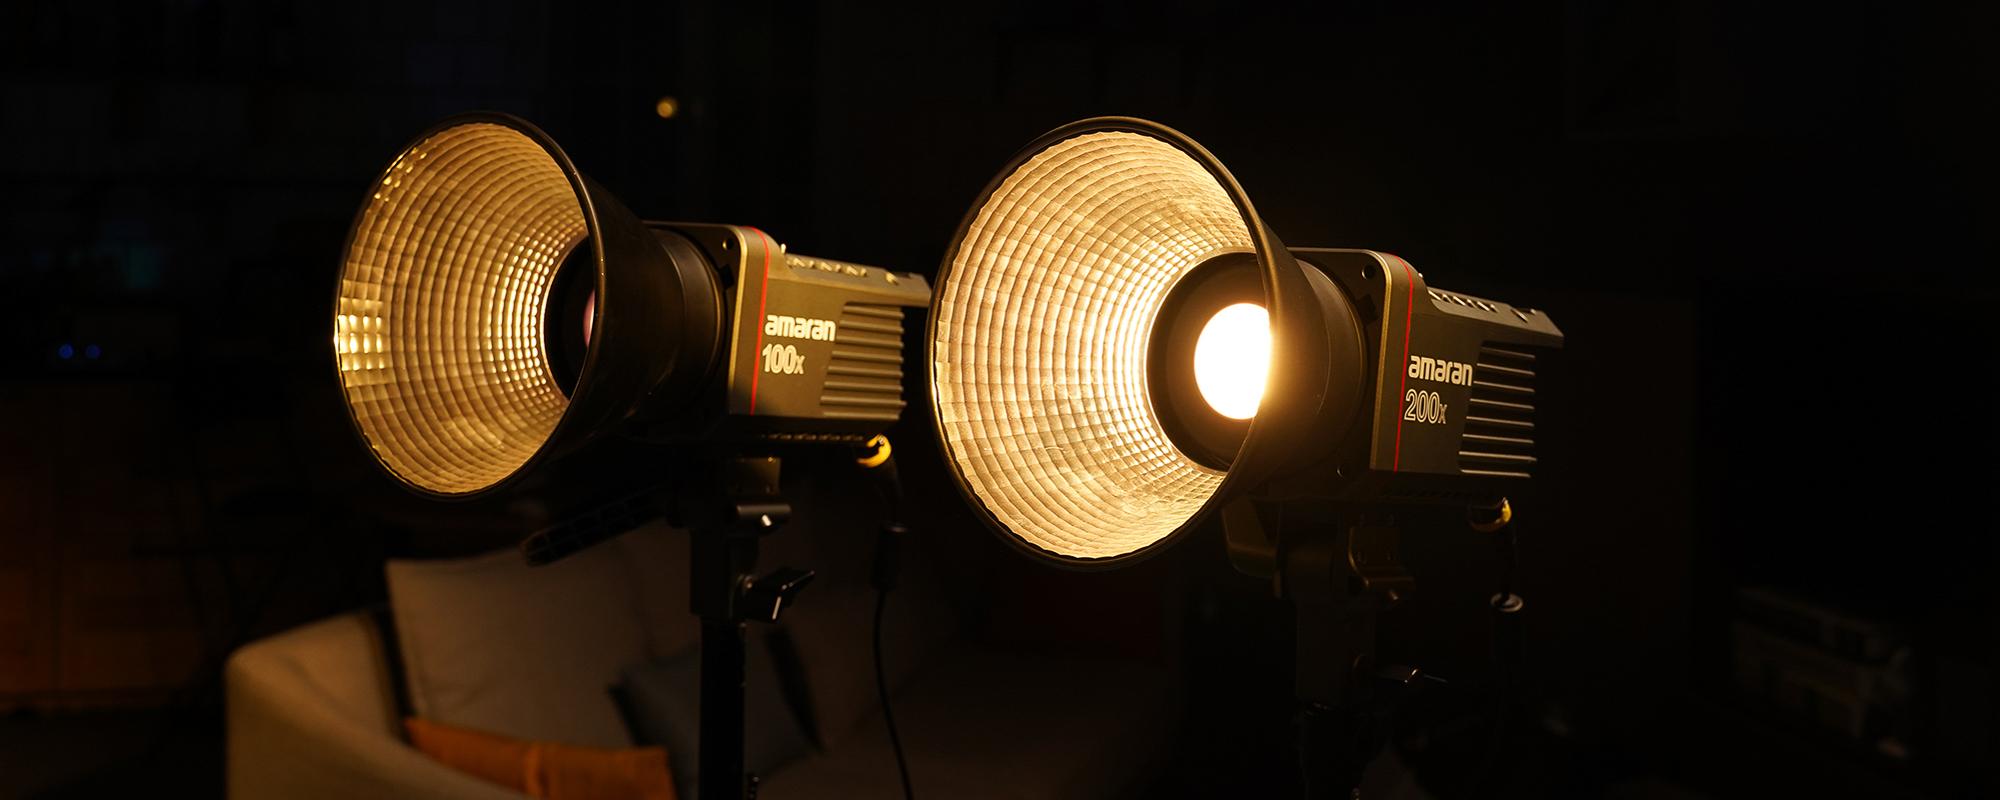 Lampa LED Amaran 100x - FX